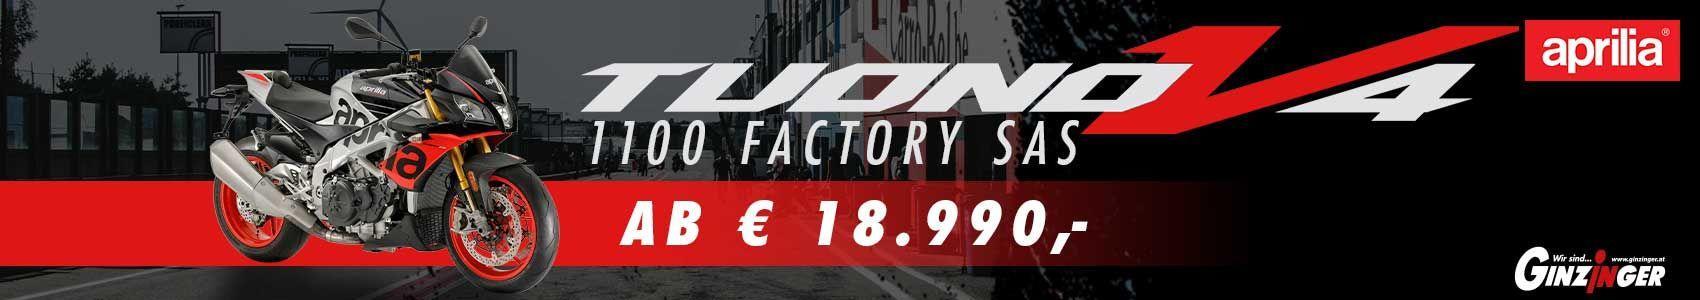 Tuono V4 Factory SAS ab € 18.990,-